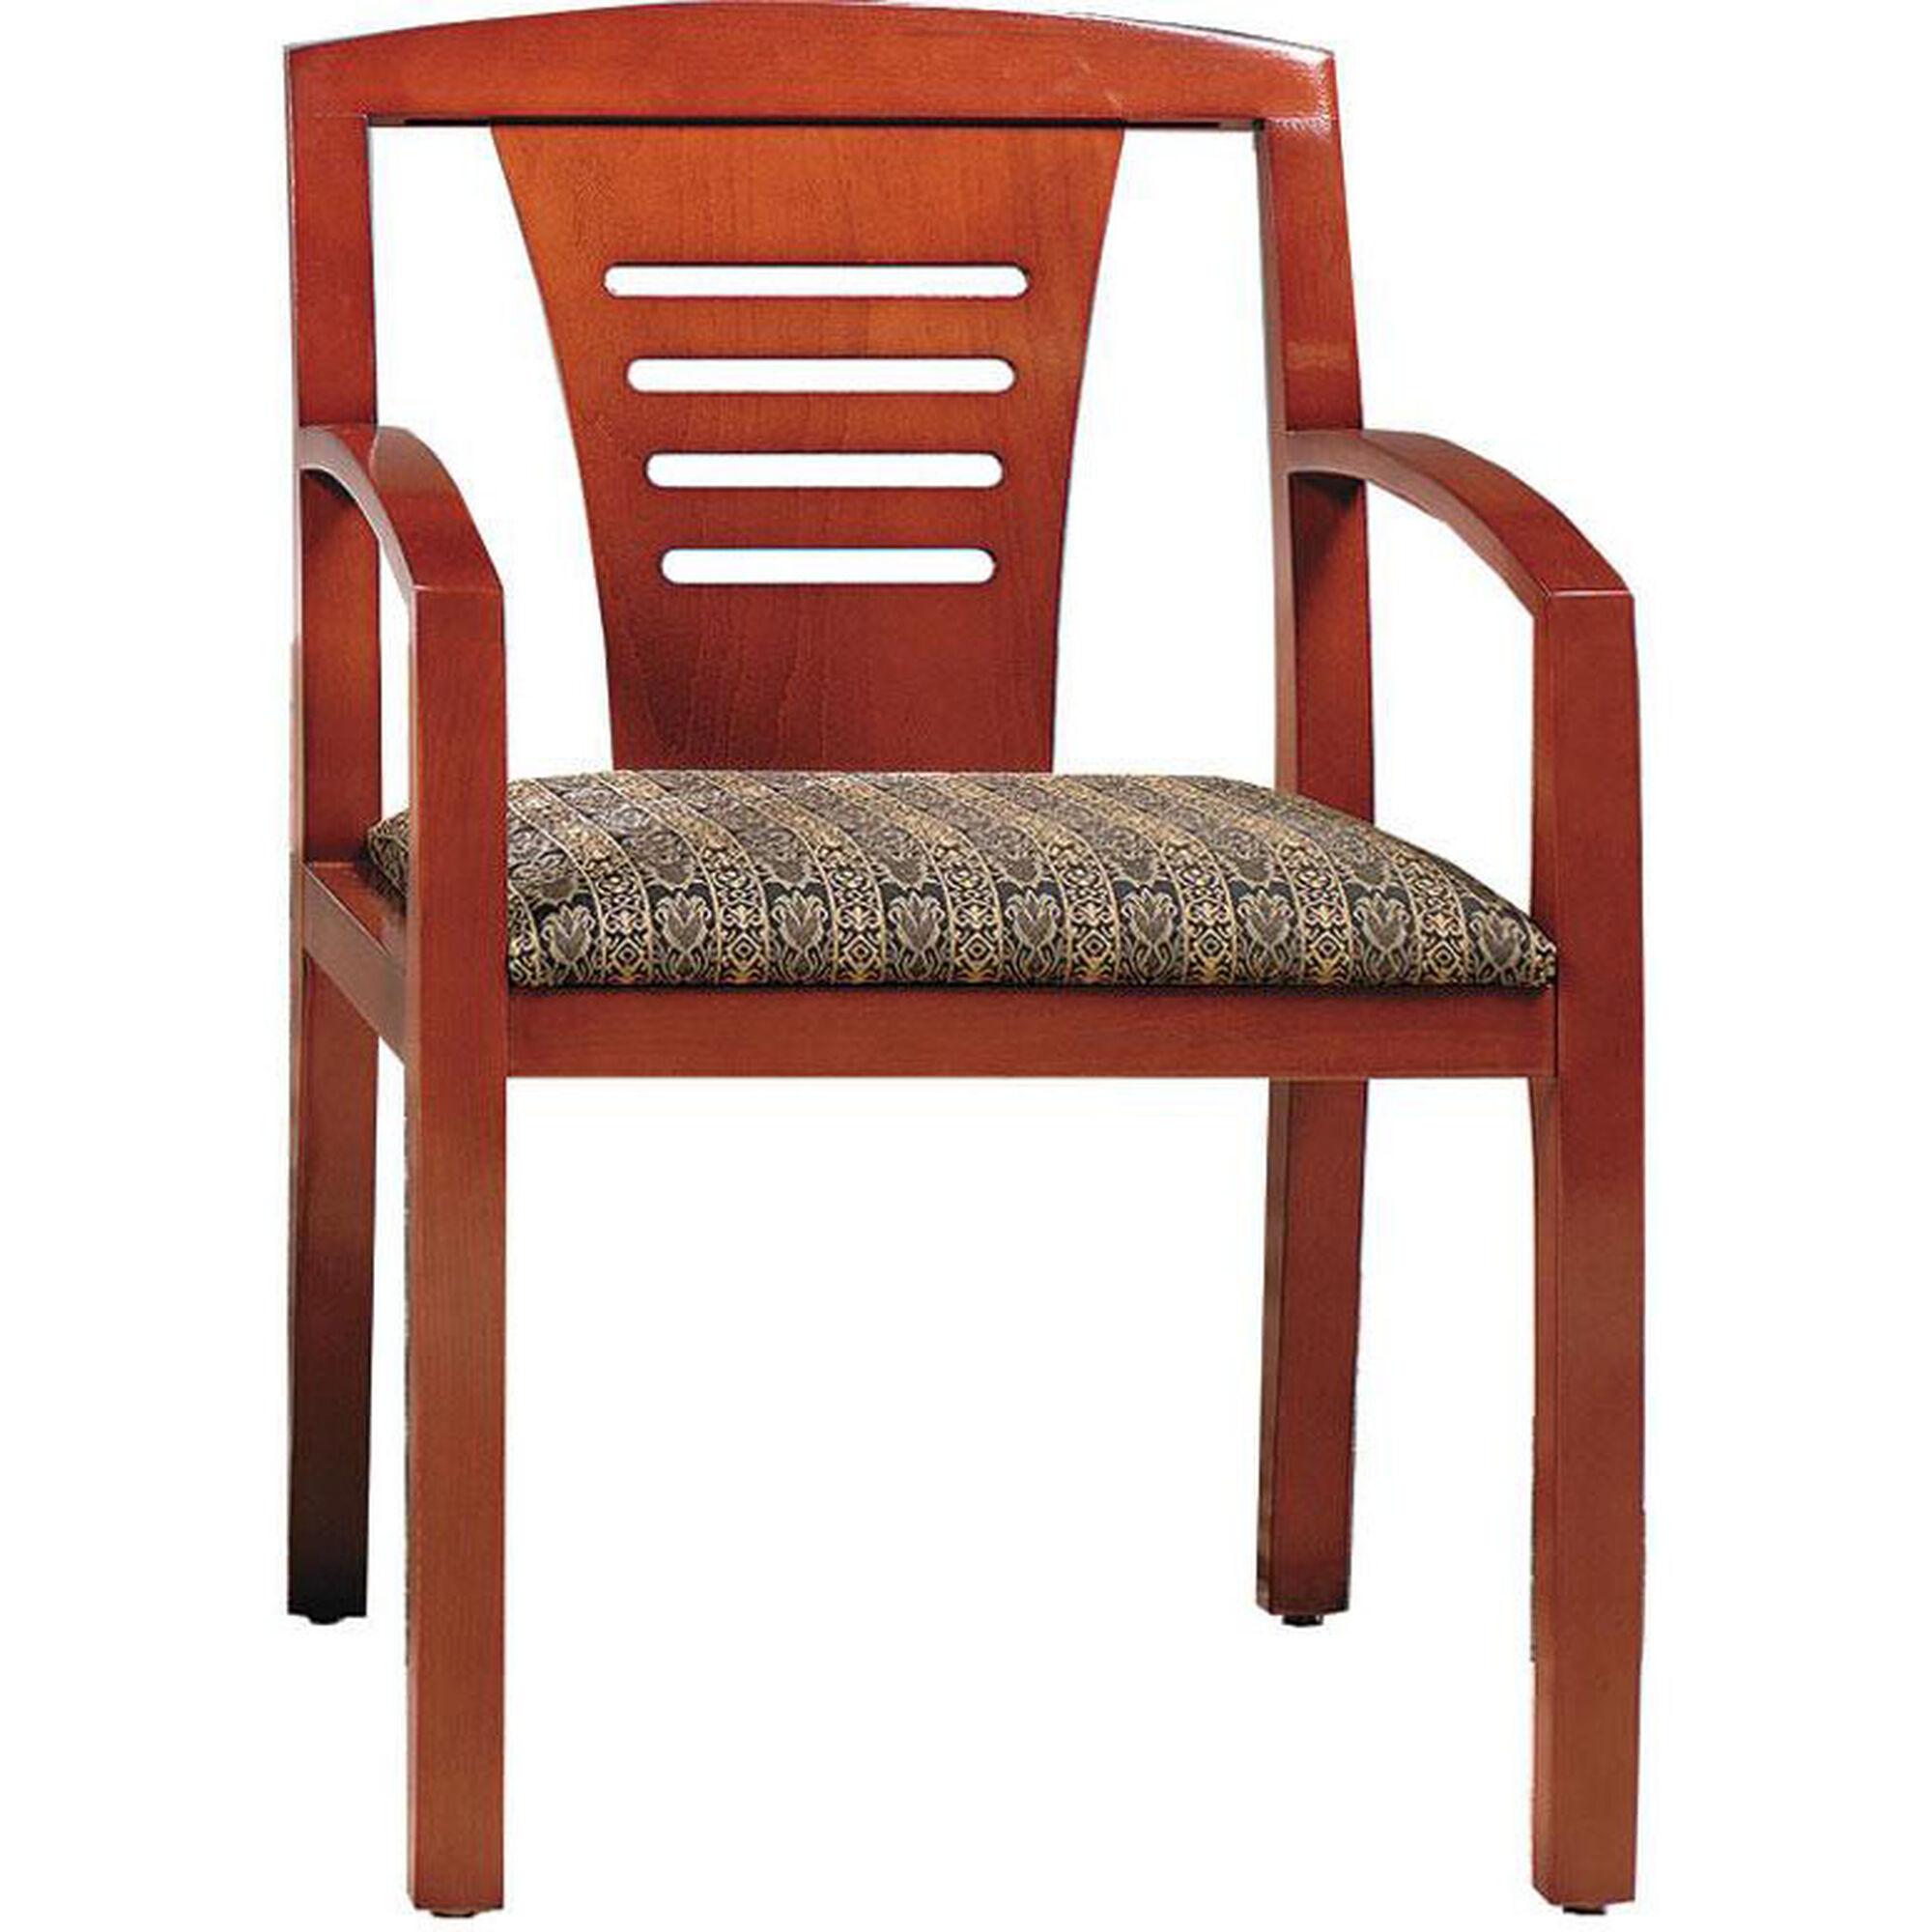 High Point Furniture Industries 9423 Hpf 9423